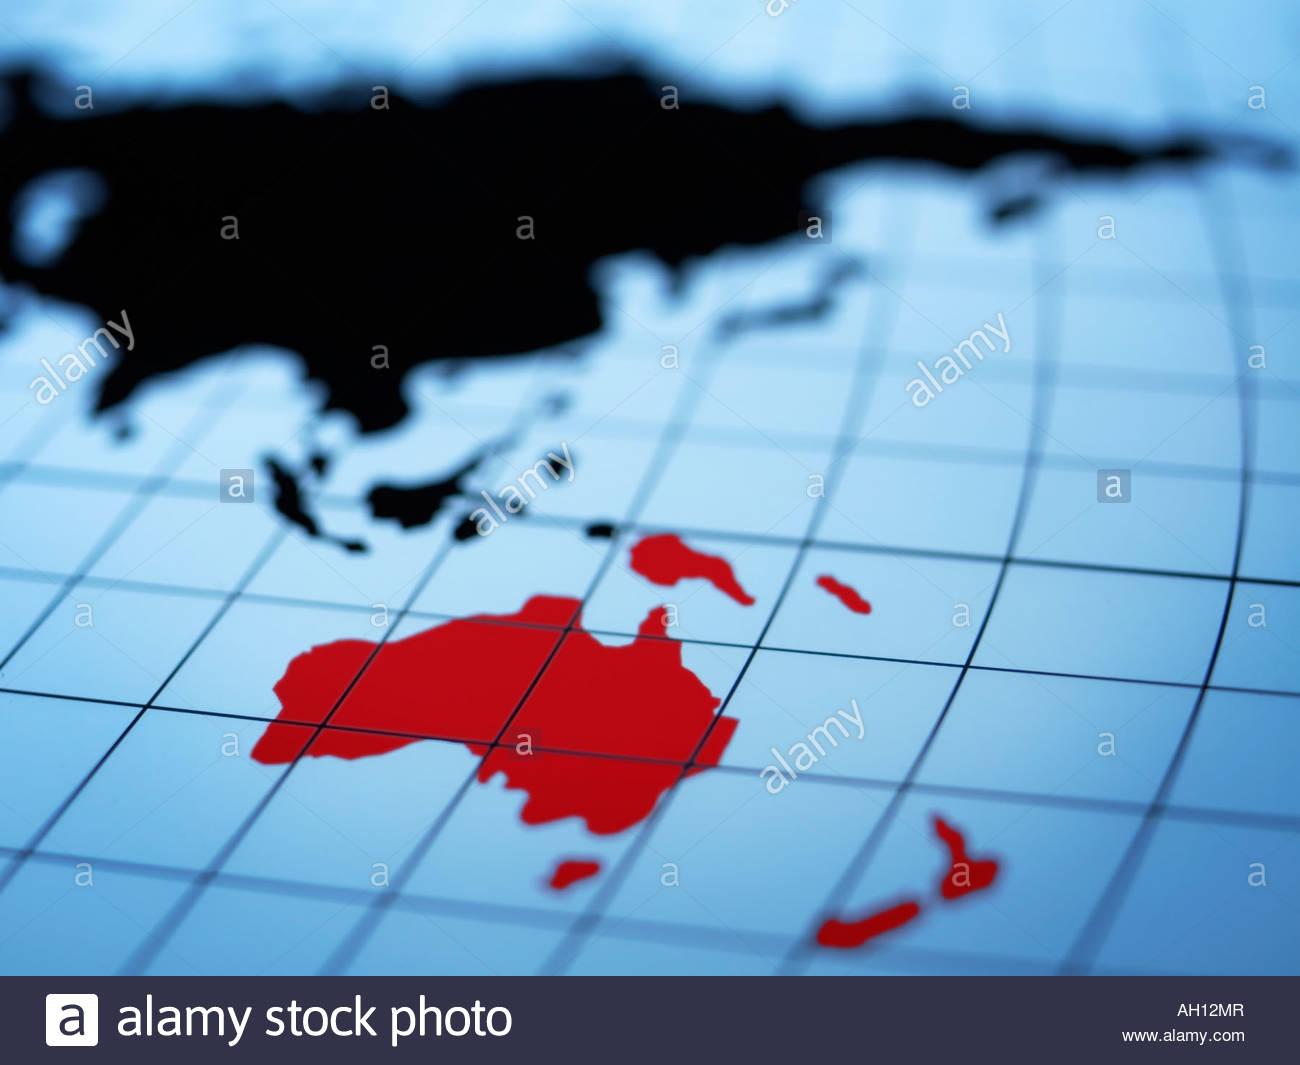 Map of eastern hemisphere highlighting Australia - Stock Image